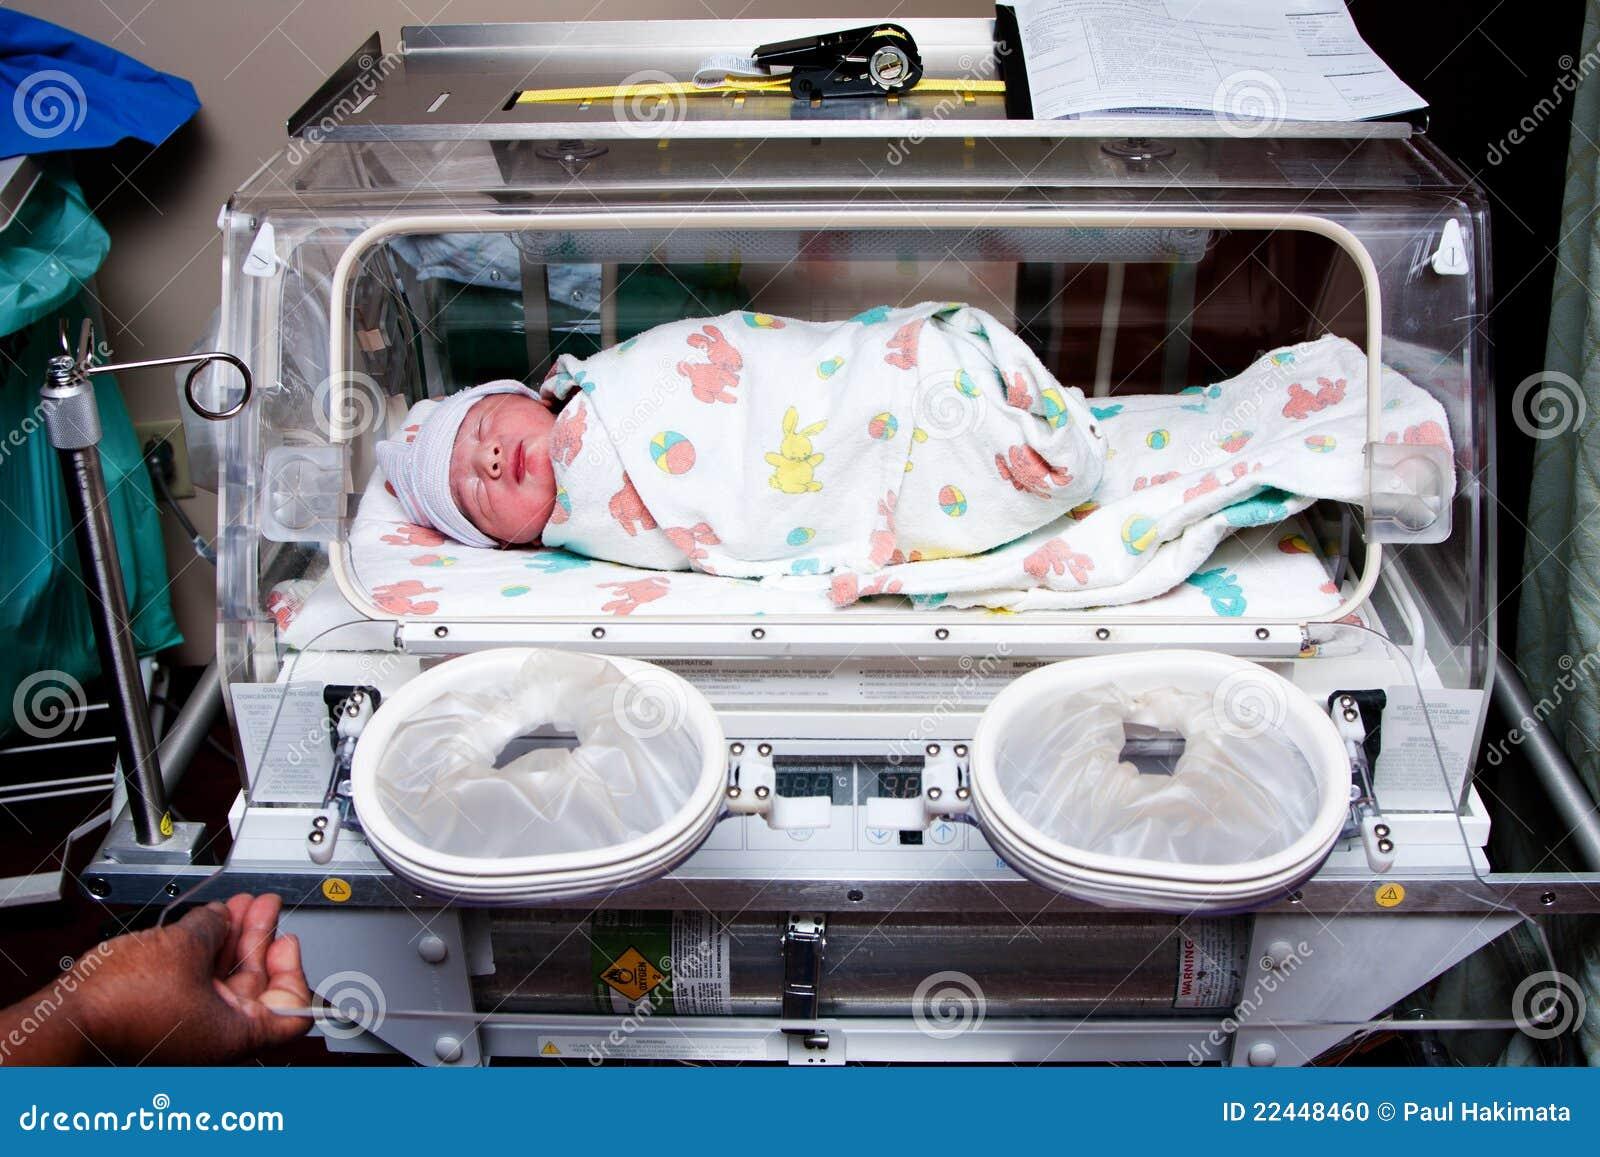 Cute Sick Baby In Incubator Stock Photo Image 22448460